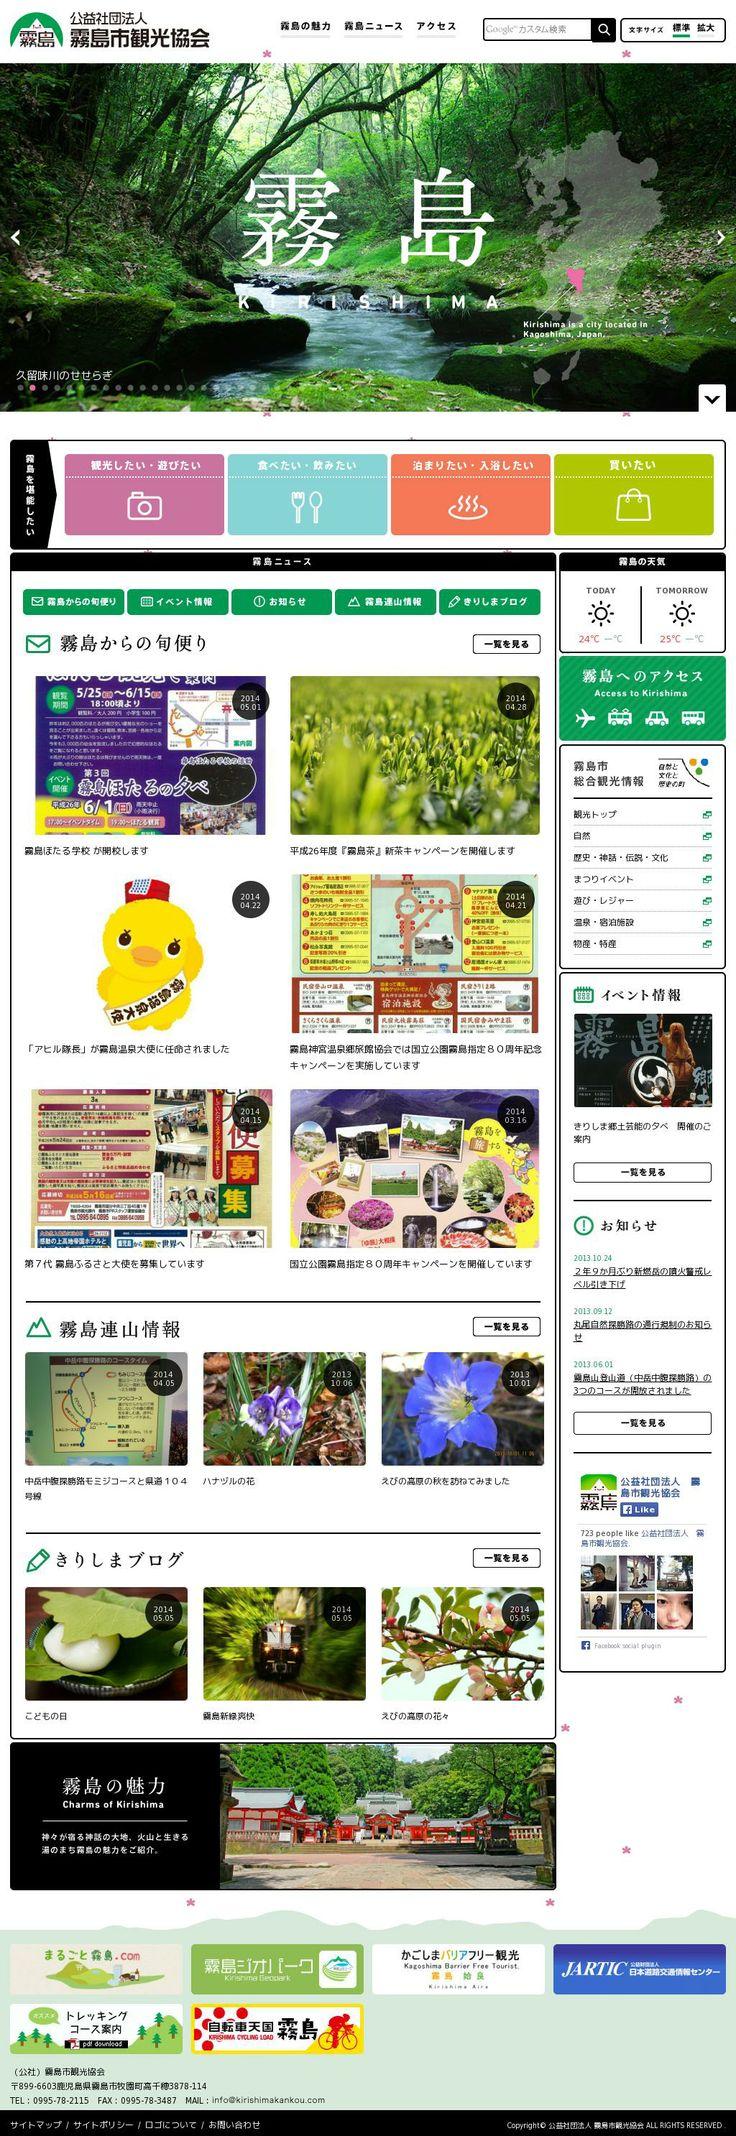 The website 'http://kirishimakankou.com/' courtesy of @Pinstamatic (http://pinstamatic.com)